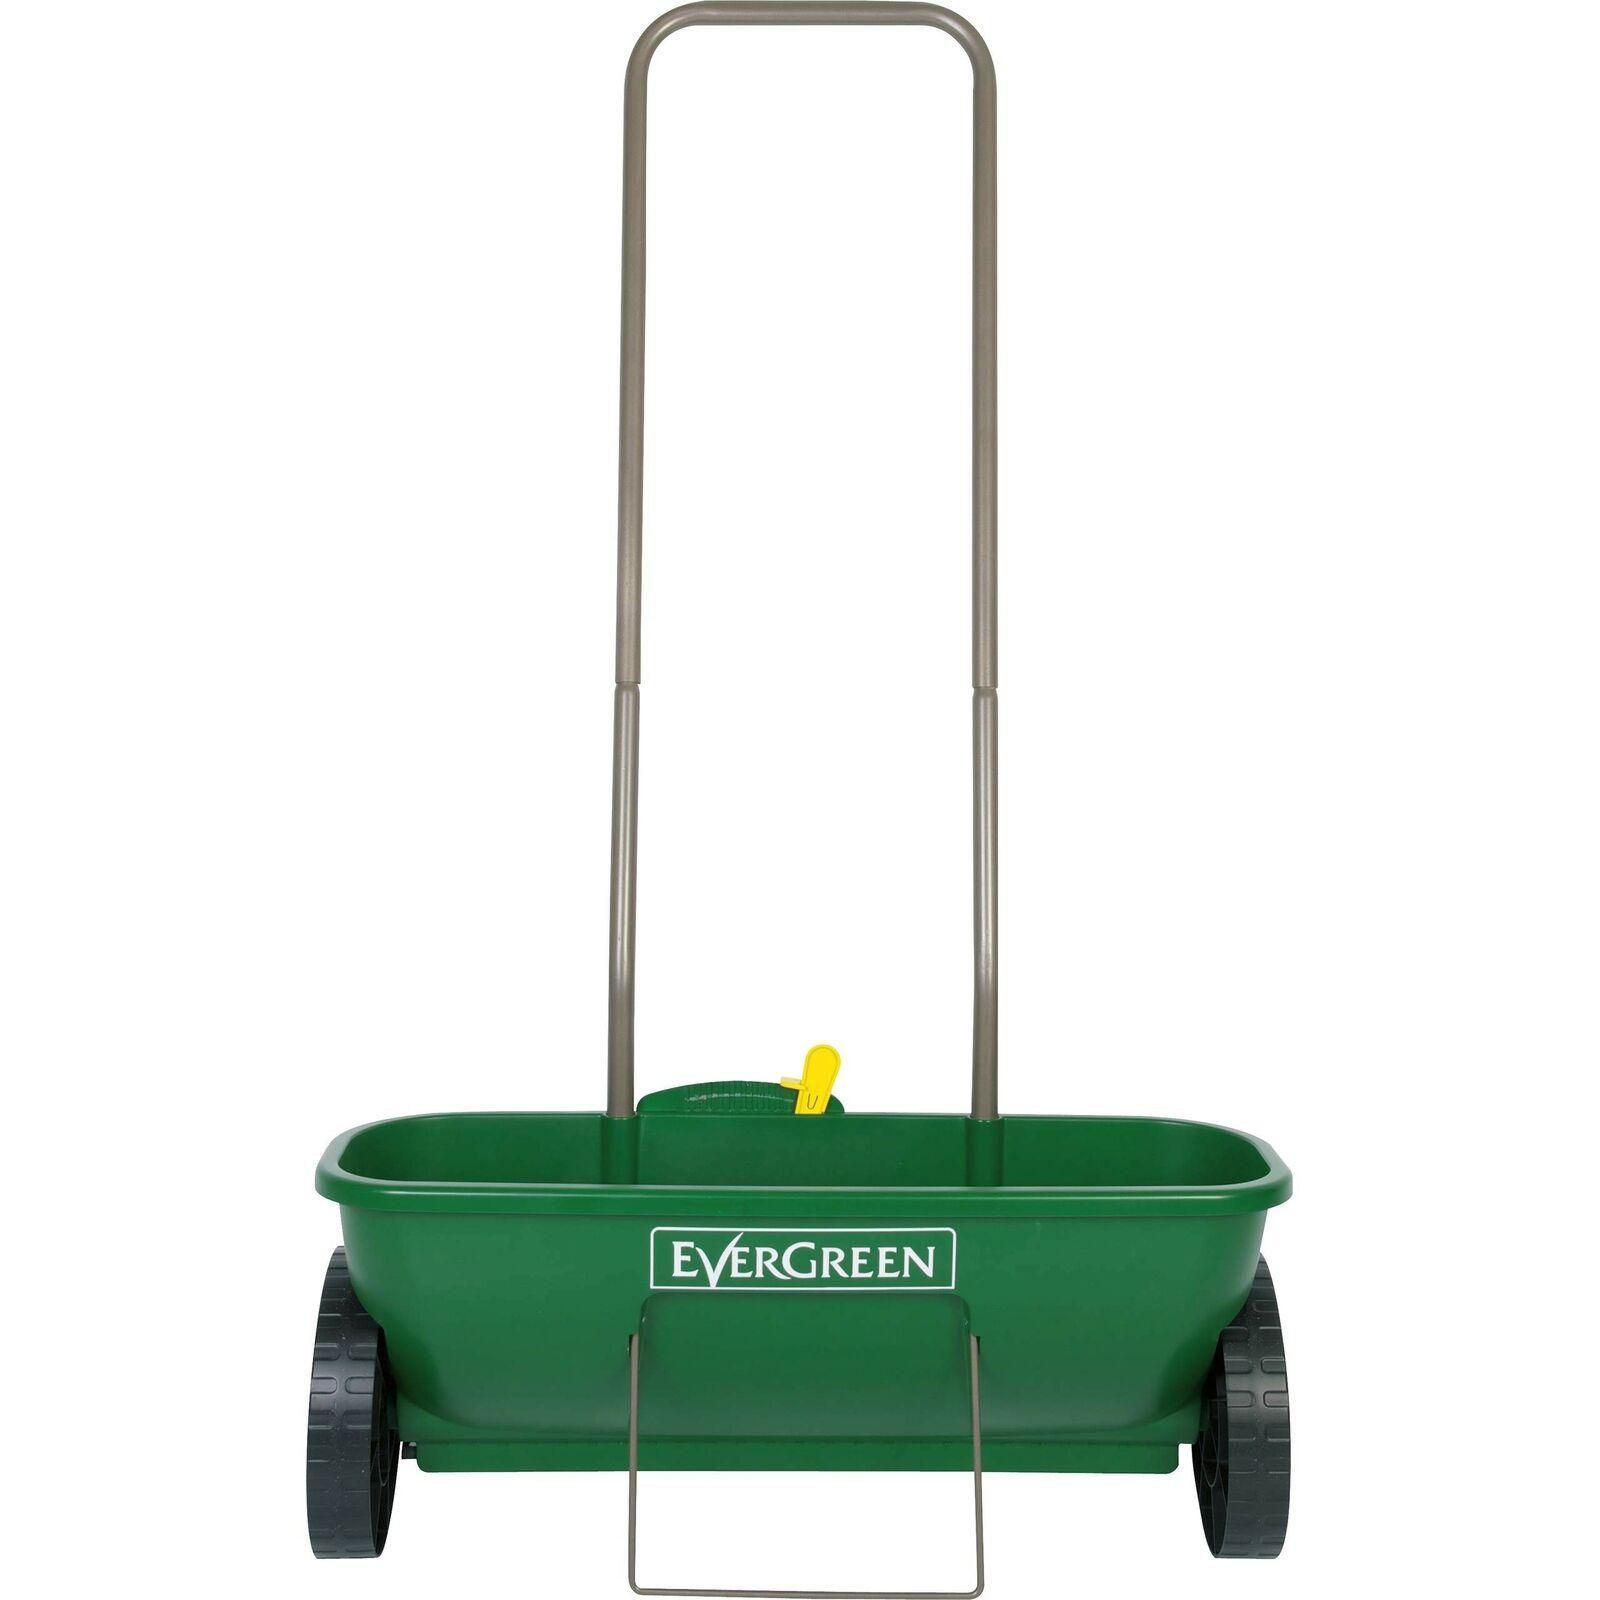 Evergreen 018920 Seed Spreader Green For Sale Online Ebay